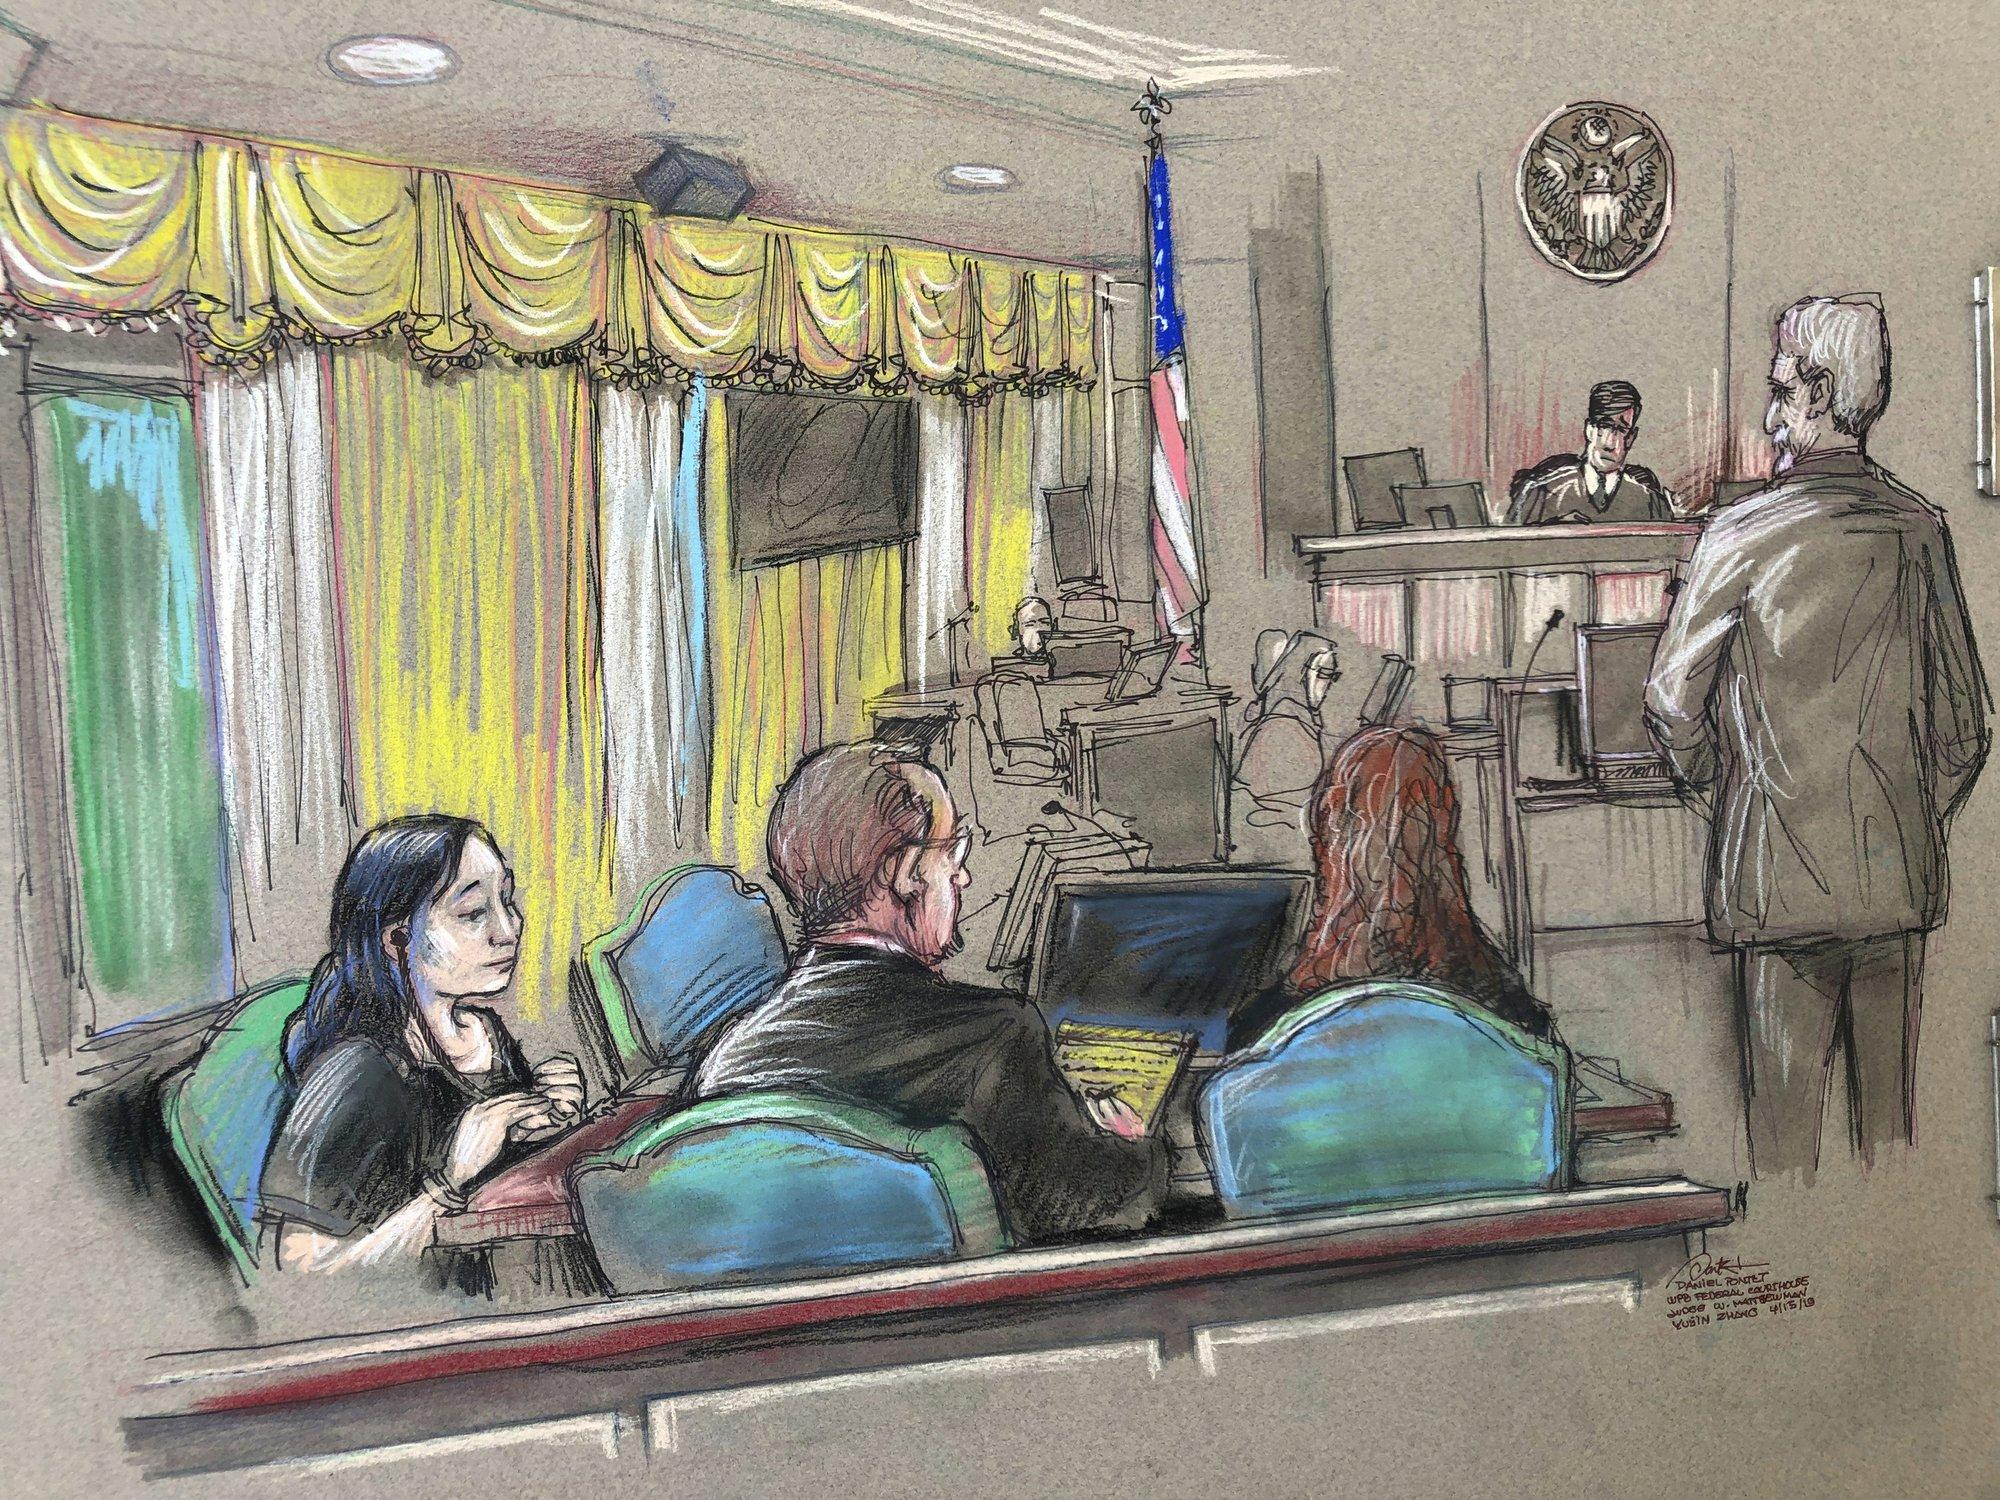 Trial delayed for Mar-a-Lago trespassing trial